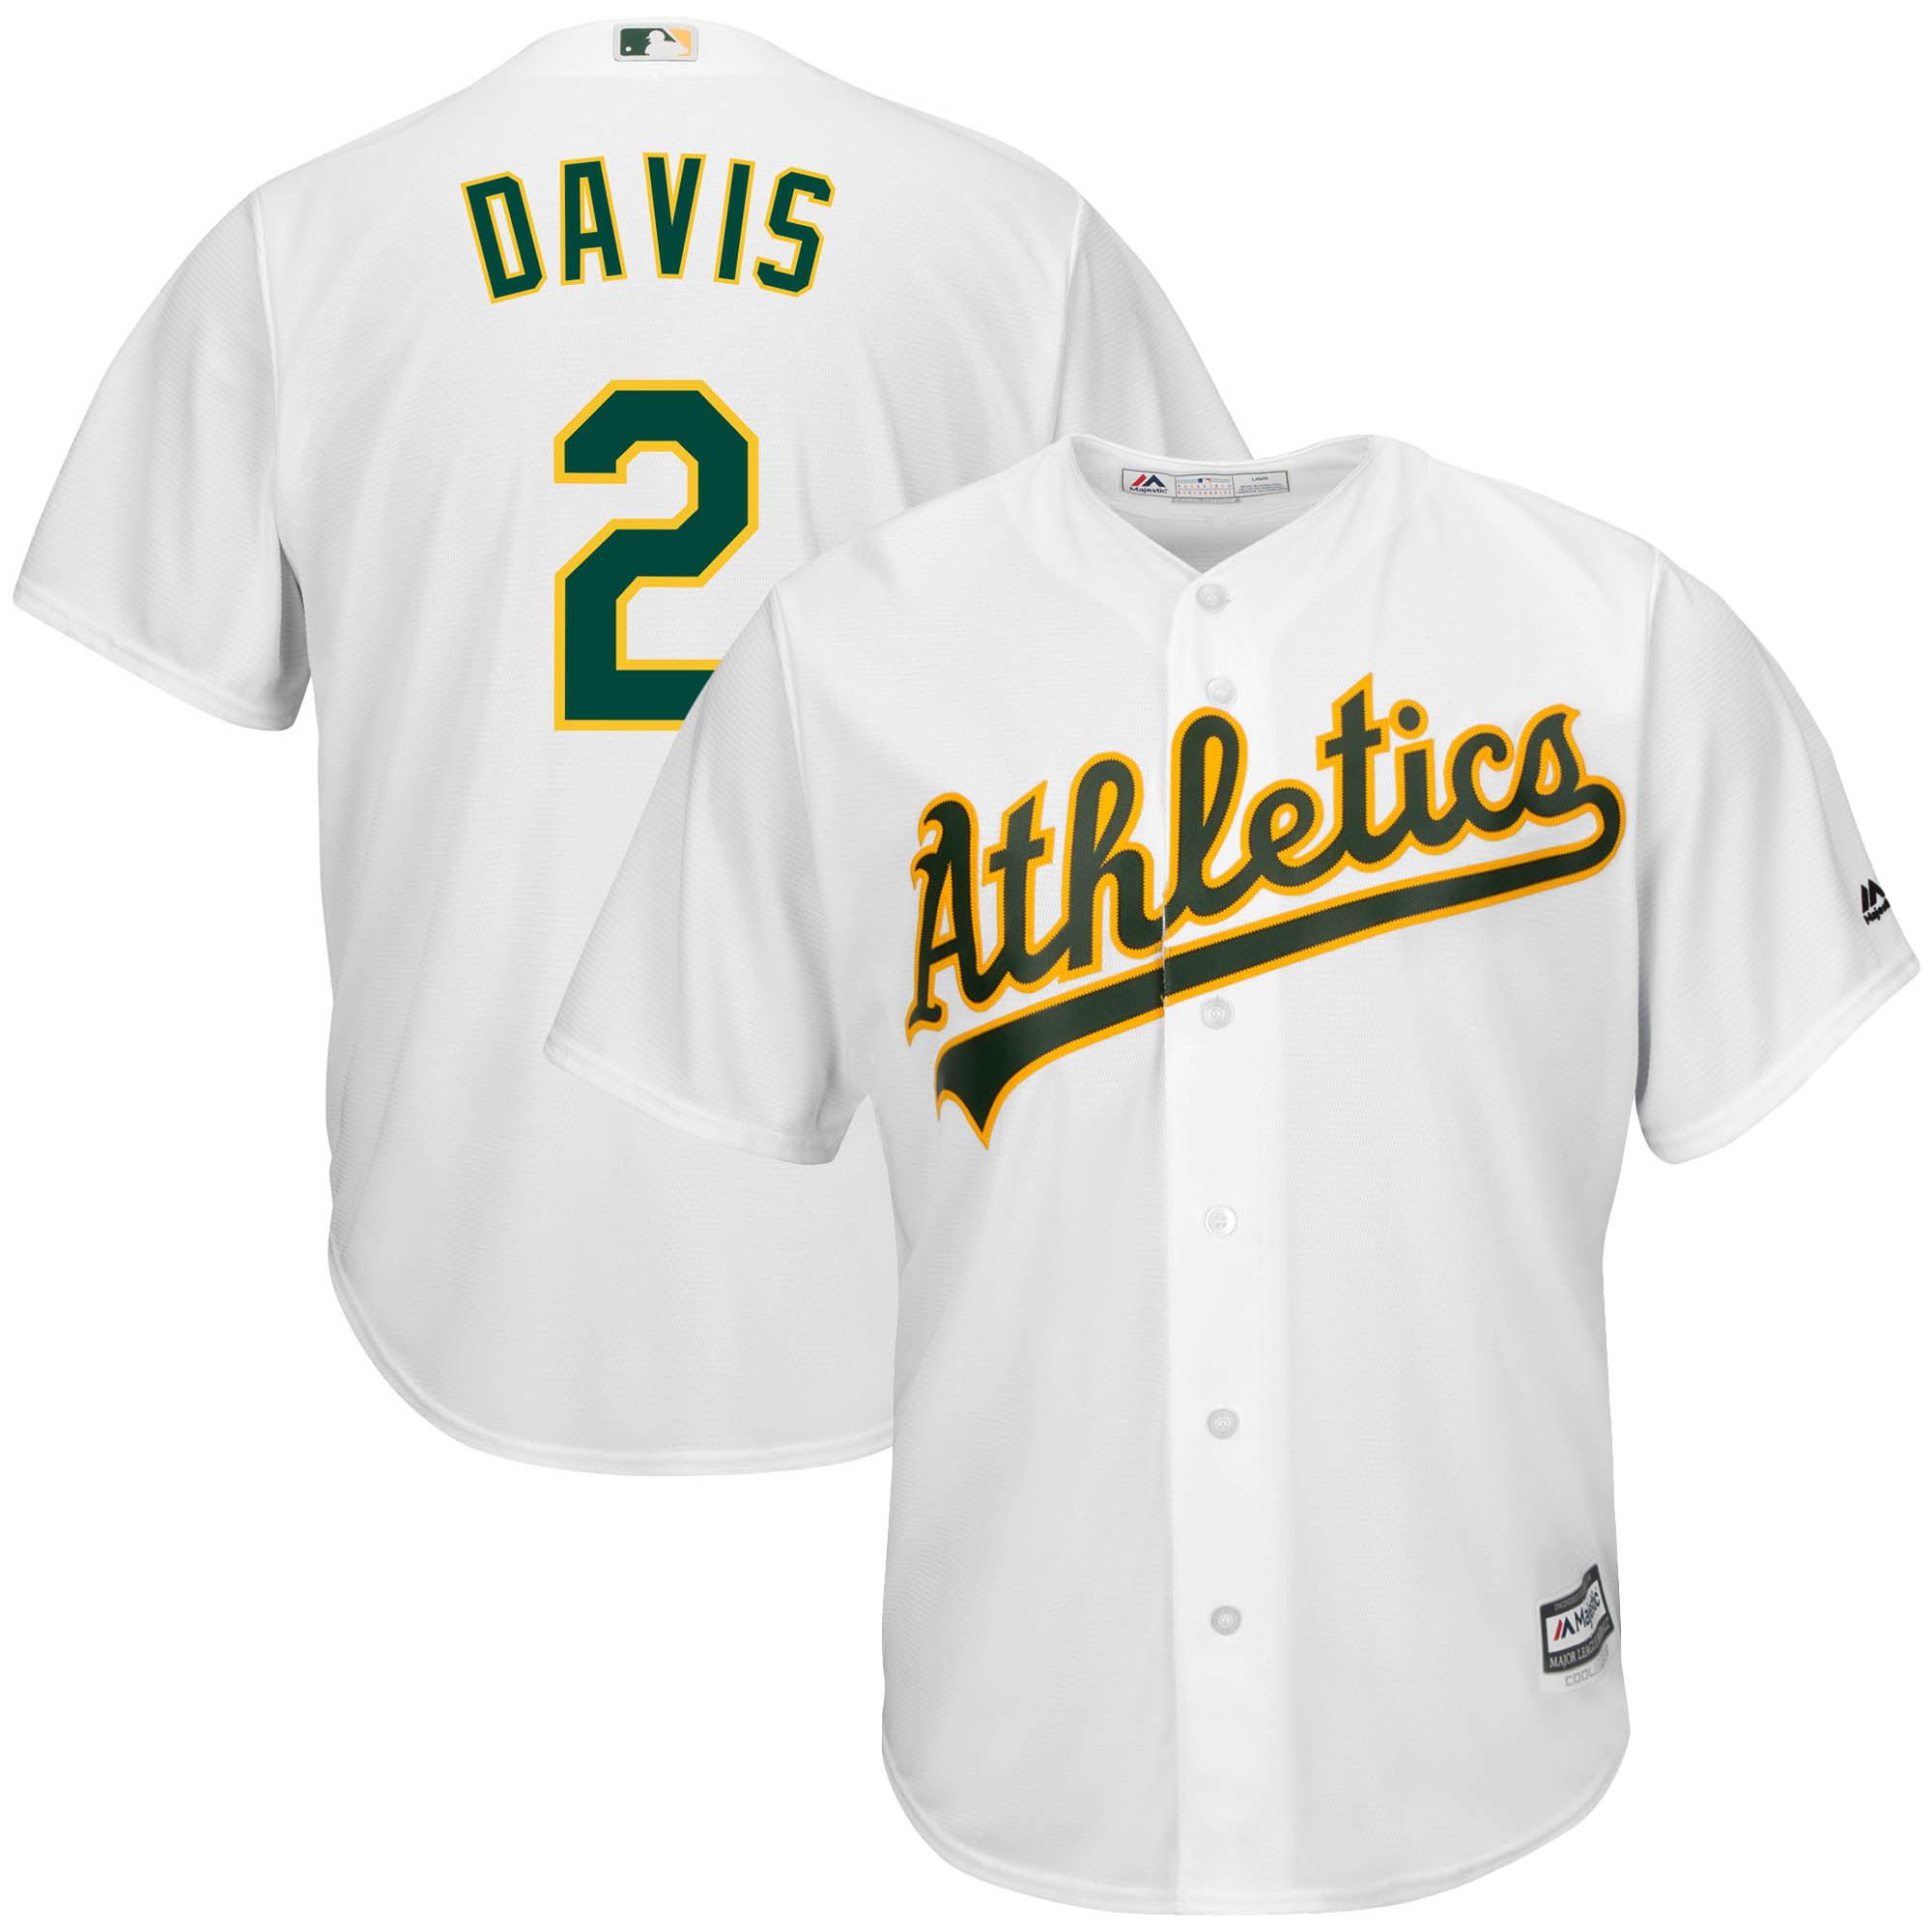 Majestic Oakland Athletics Home White Cool Base Toddler Jerseys